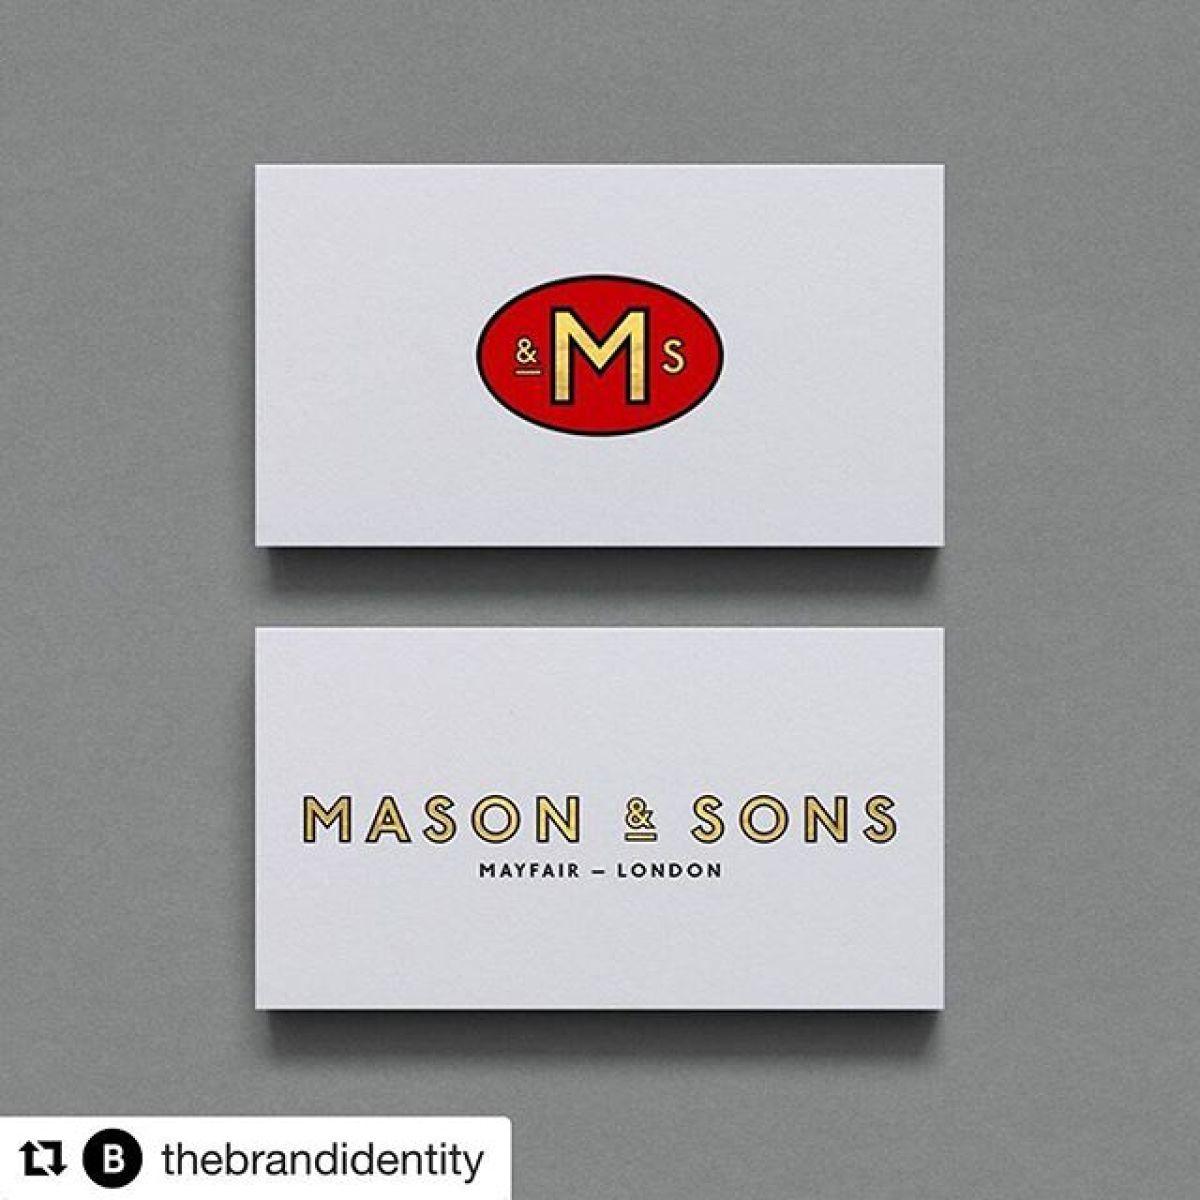 #Repost @thebrandidentity・・・Mason & Sons by @supreme_dba-See more on the sitewww.the-brandidentity.com-#logo #branding #brandidentity #logotype #graphicdesign #design #contemporary #typography #studio